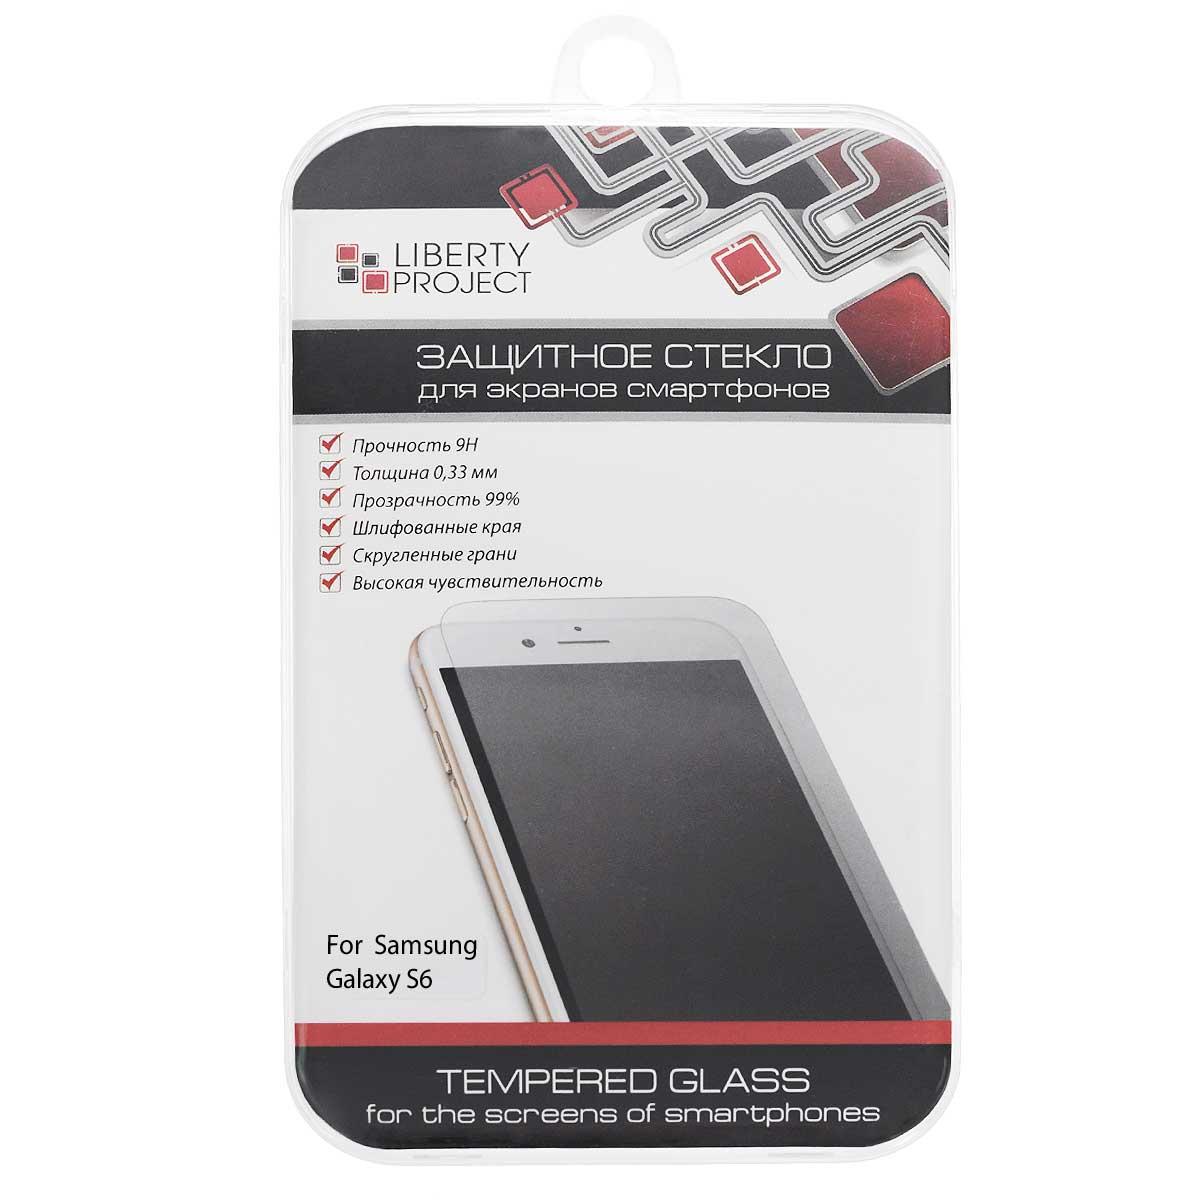 Liberty Project Tempered Glass защитное стекло для Samsung Galaxy S6, Clear (0,33 мм) цена